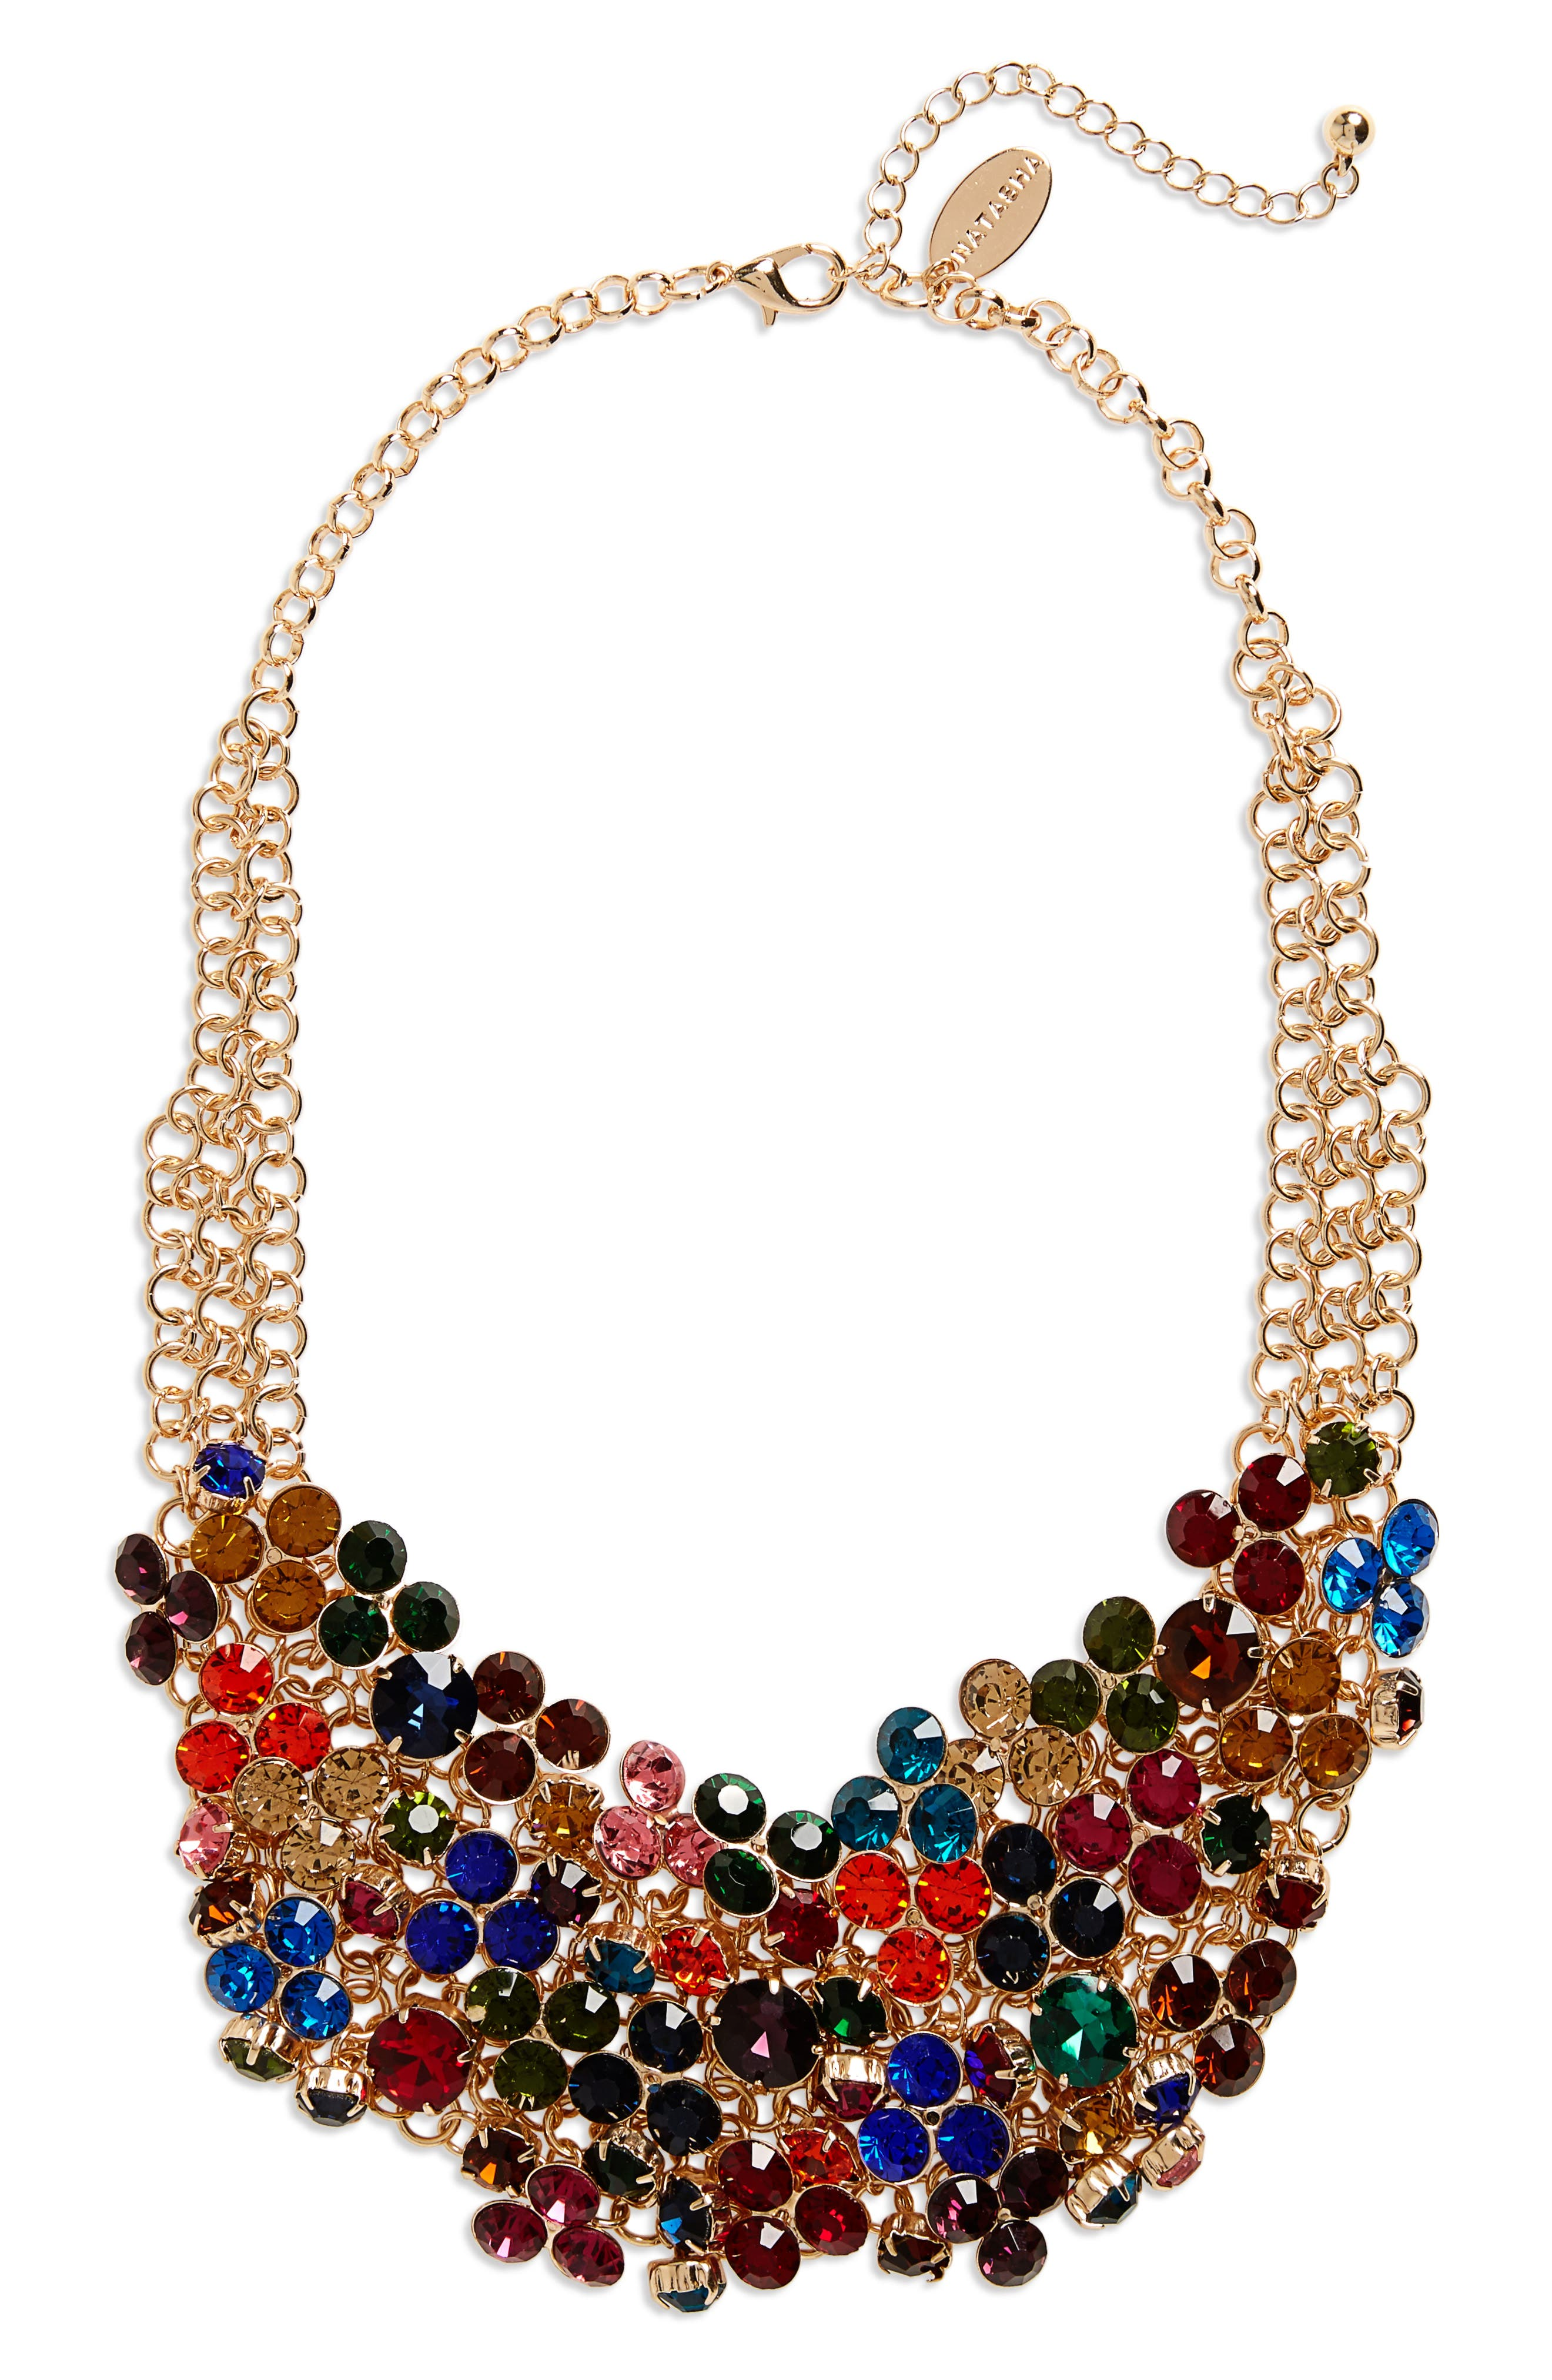 Natasha Crystal Bib Necklace